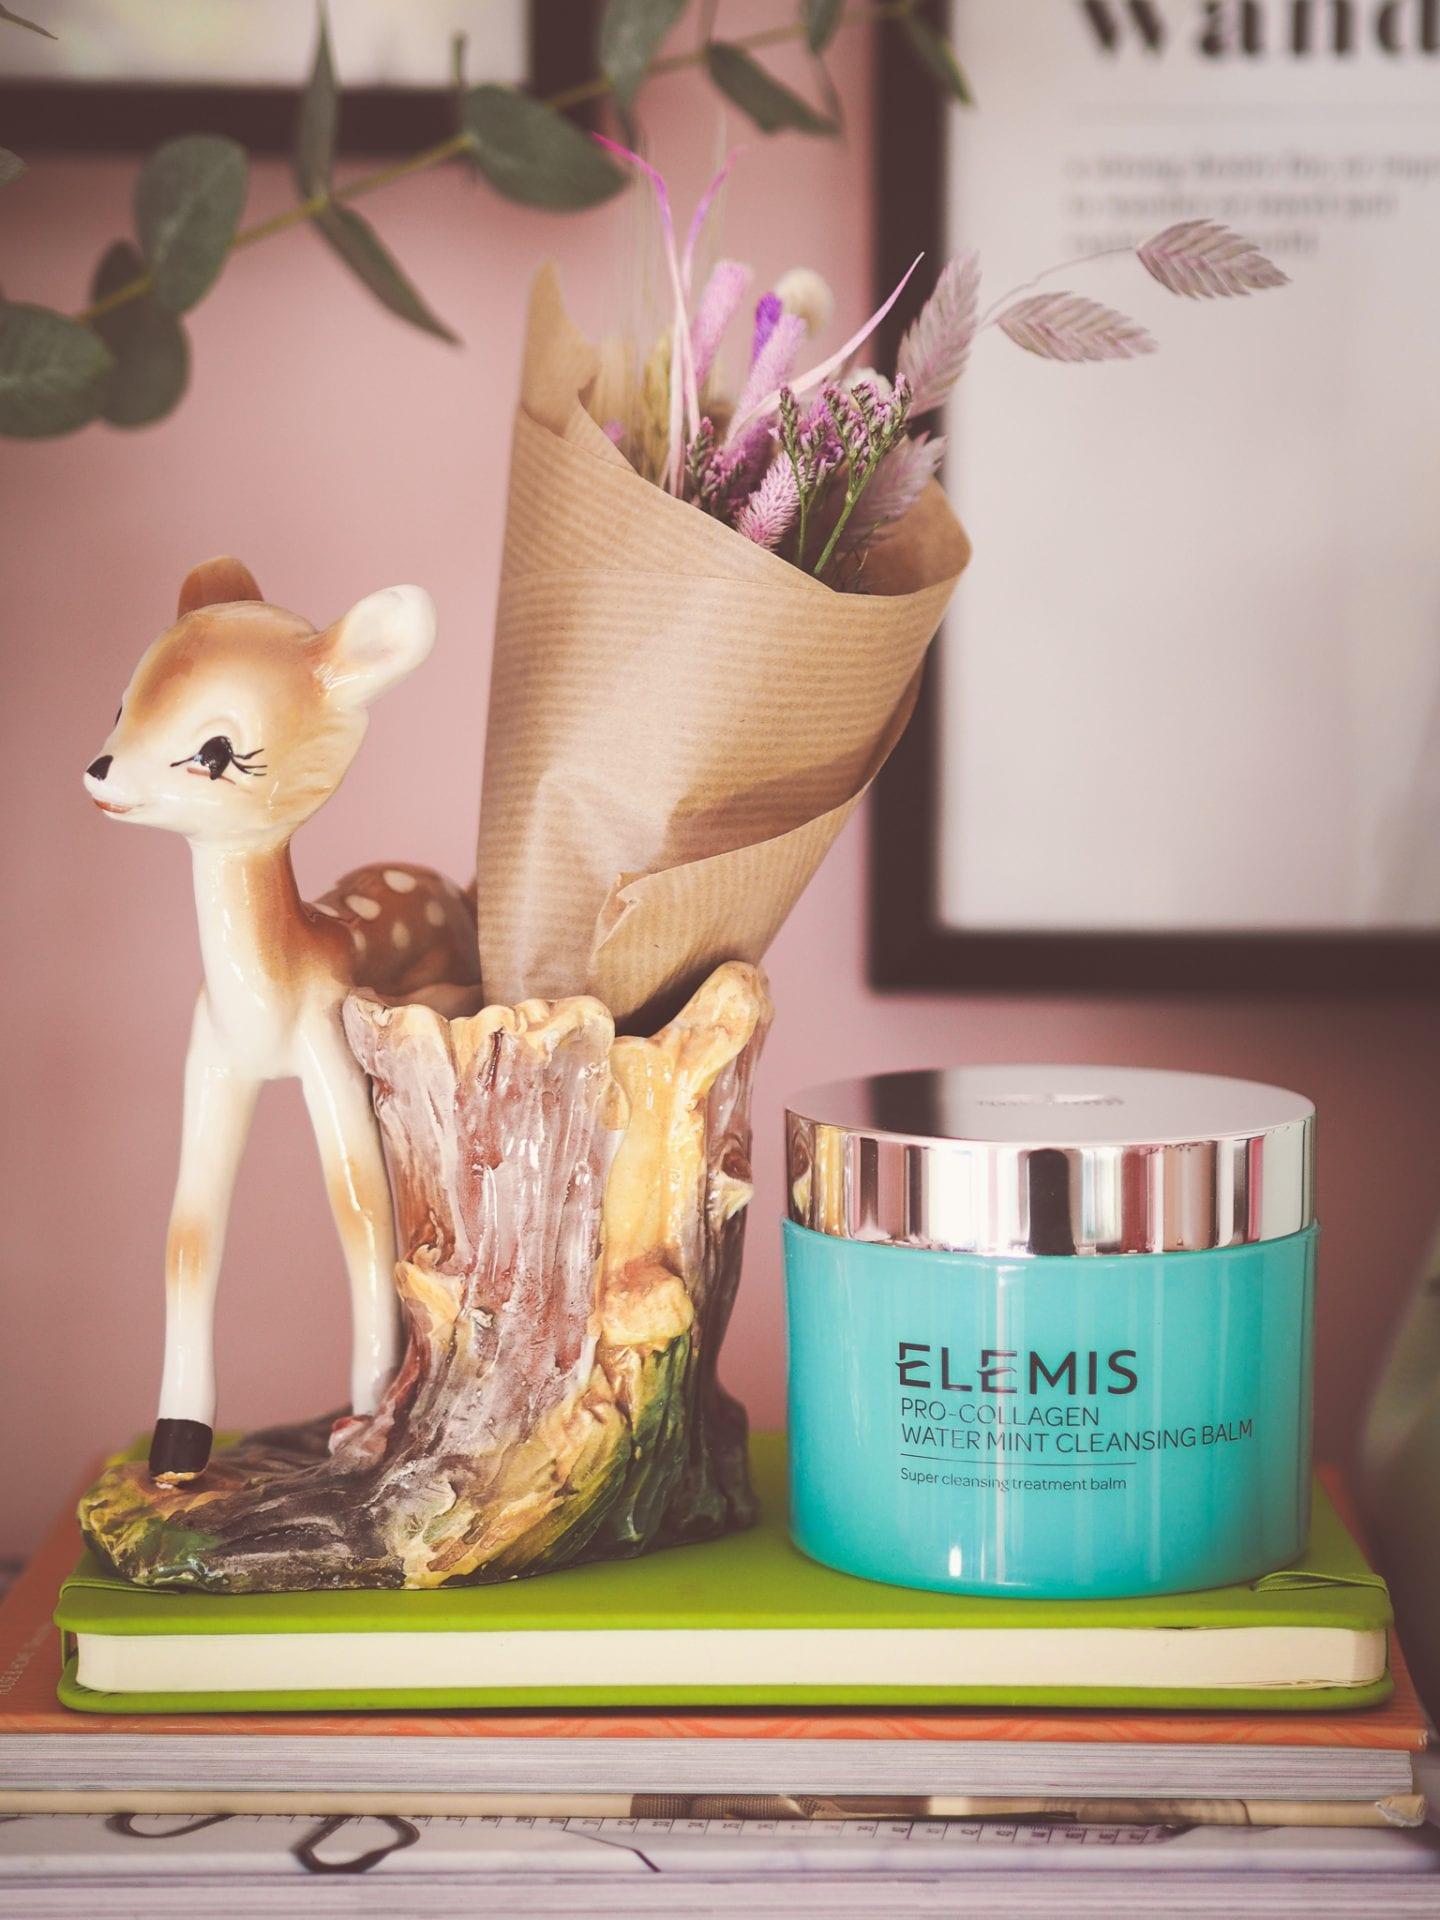 Elemis Pro collagen Water Mint Cleansing Balm